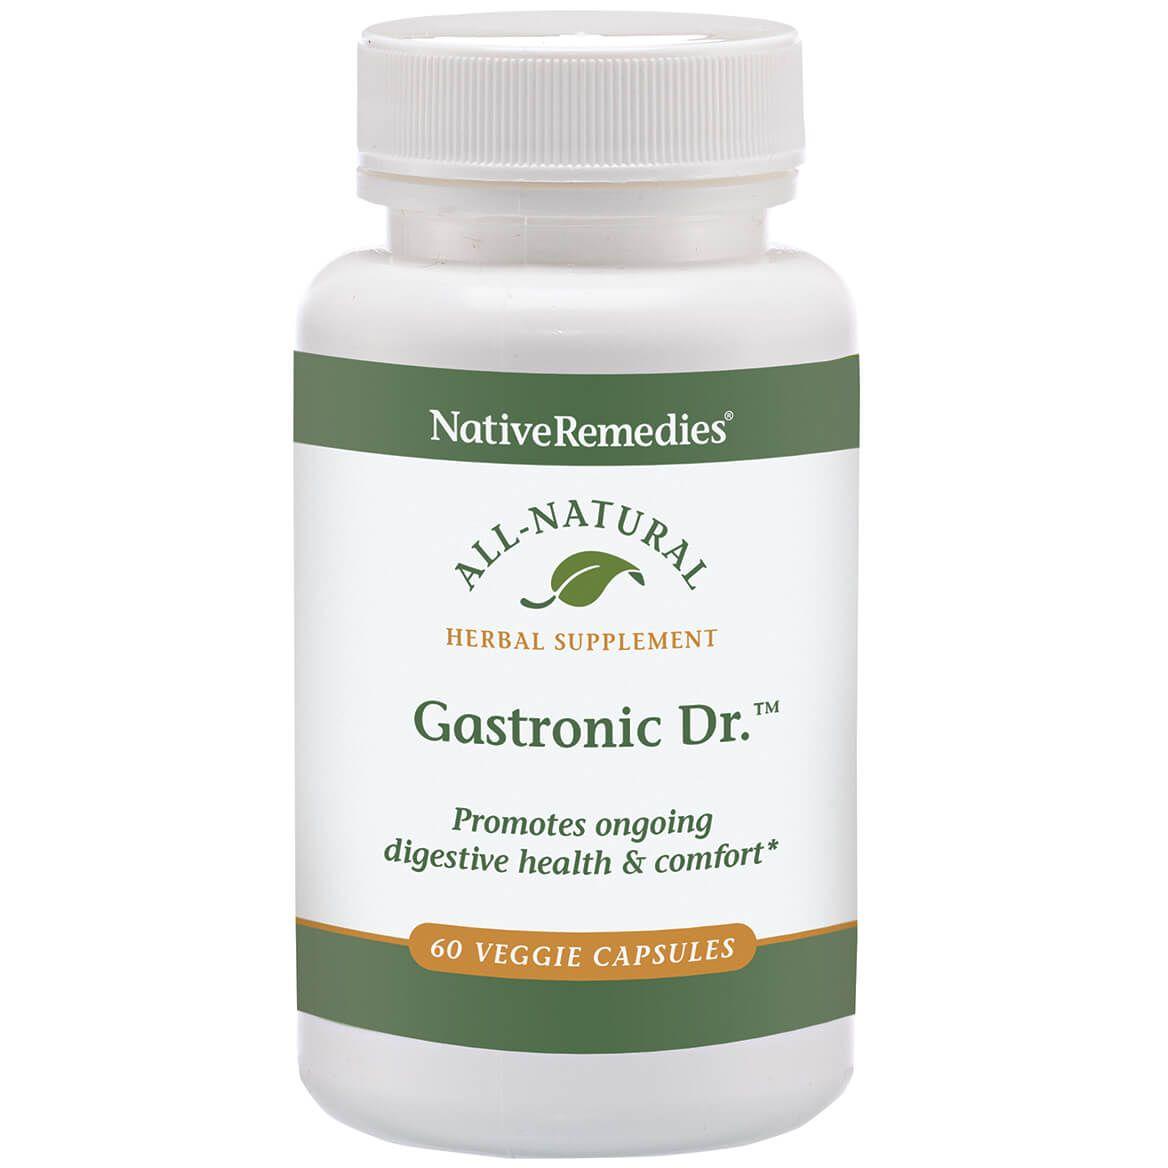 NativeRemedies® Gastronic Dr.™ Veggie Cap-351040